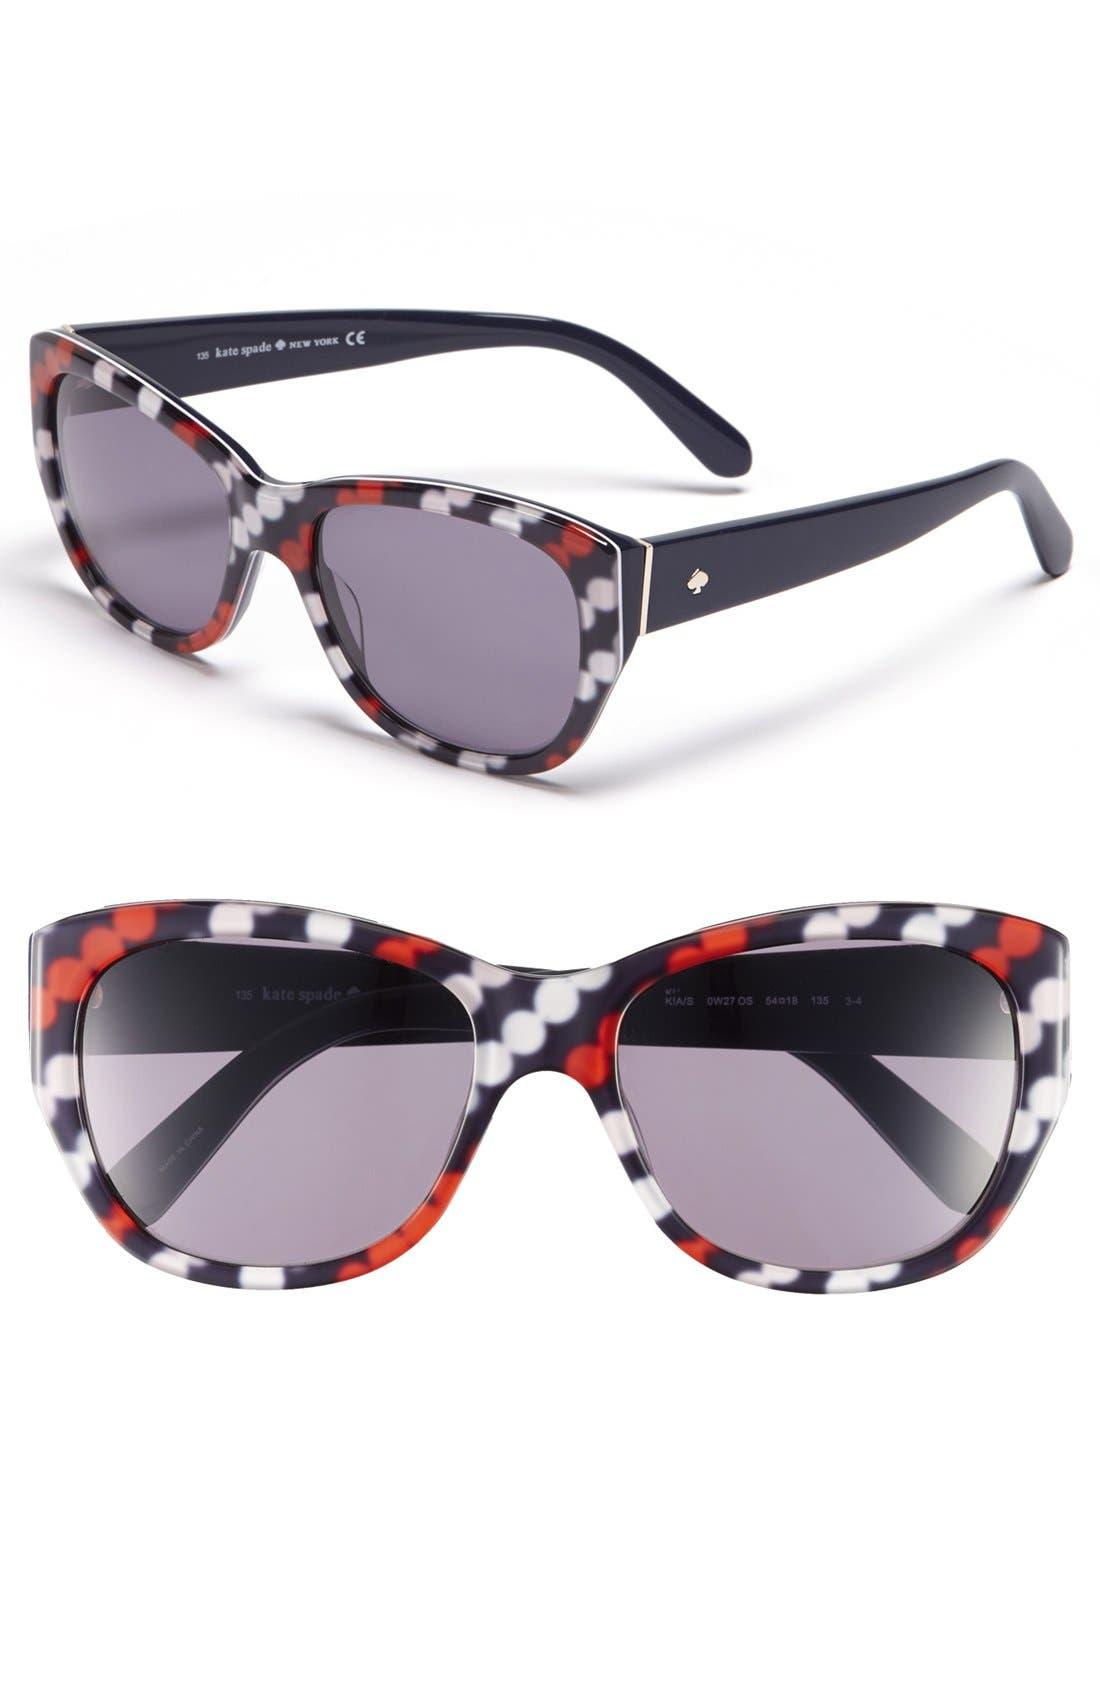 Alternate Image 1 Selected - kate spade new york 'kia' 54mm cat eye sunglasses